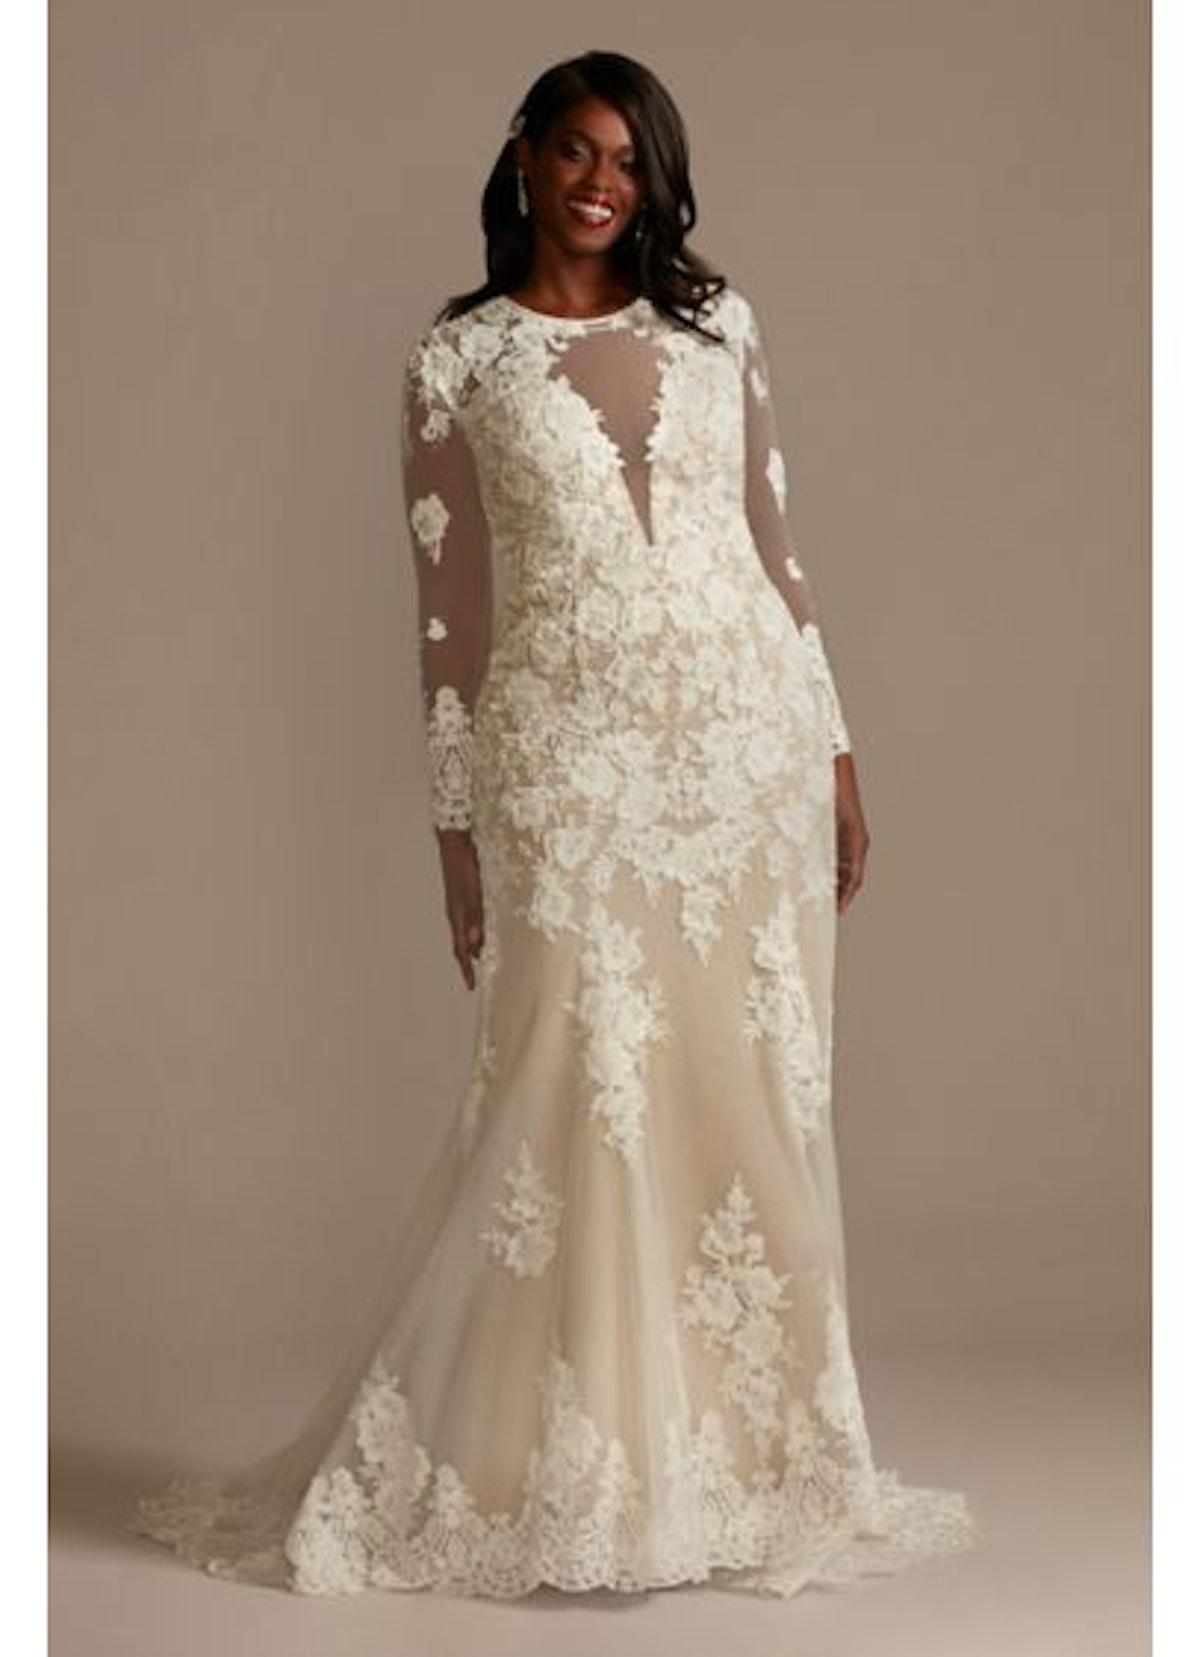 Long Sleeve Plus Size Sequin Floral Wedding Dress David's Bridal